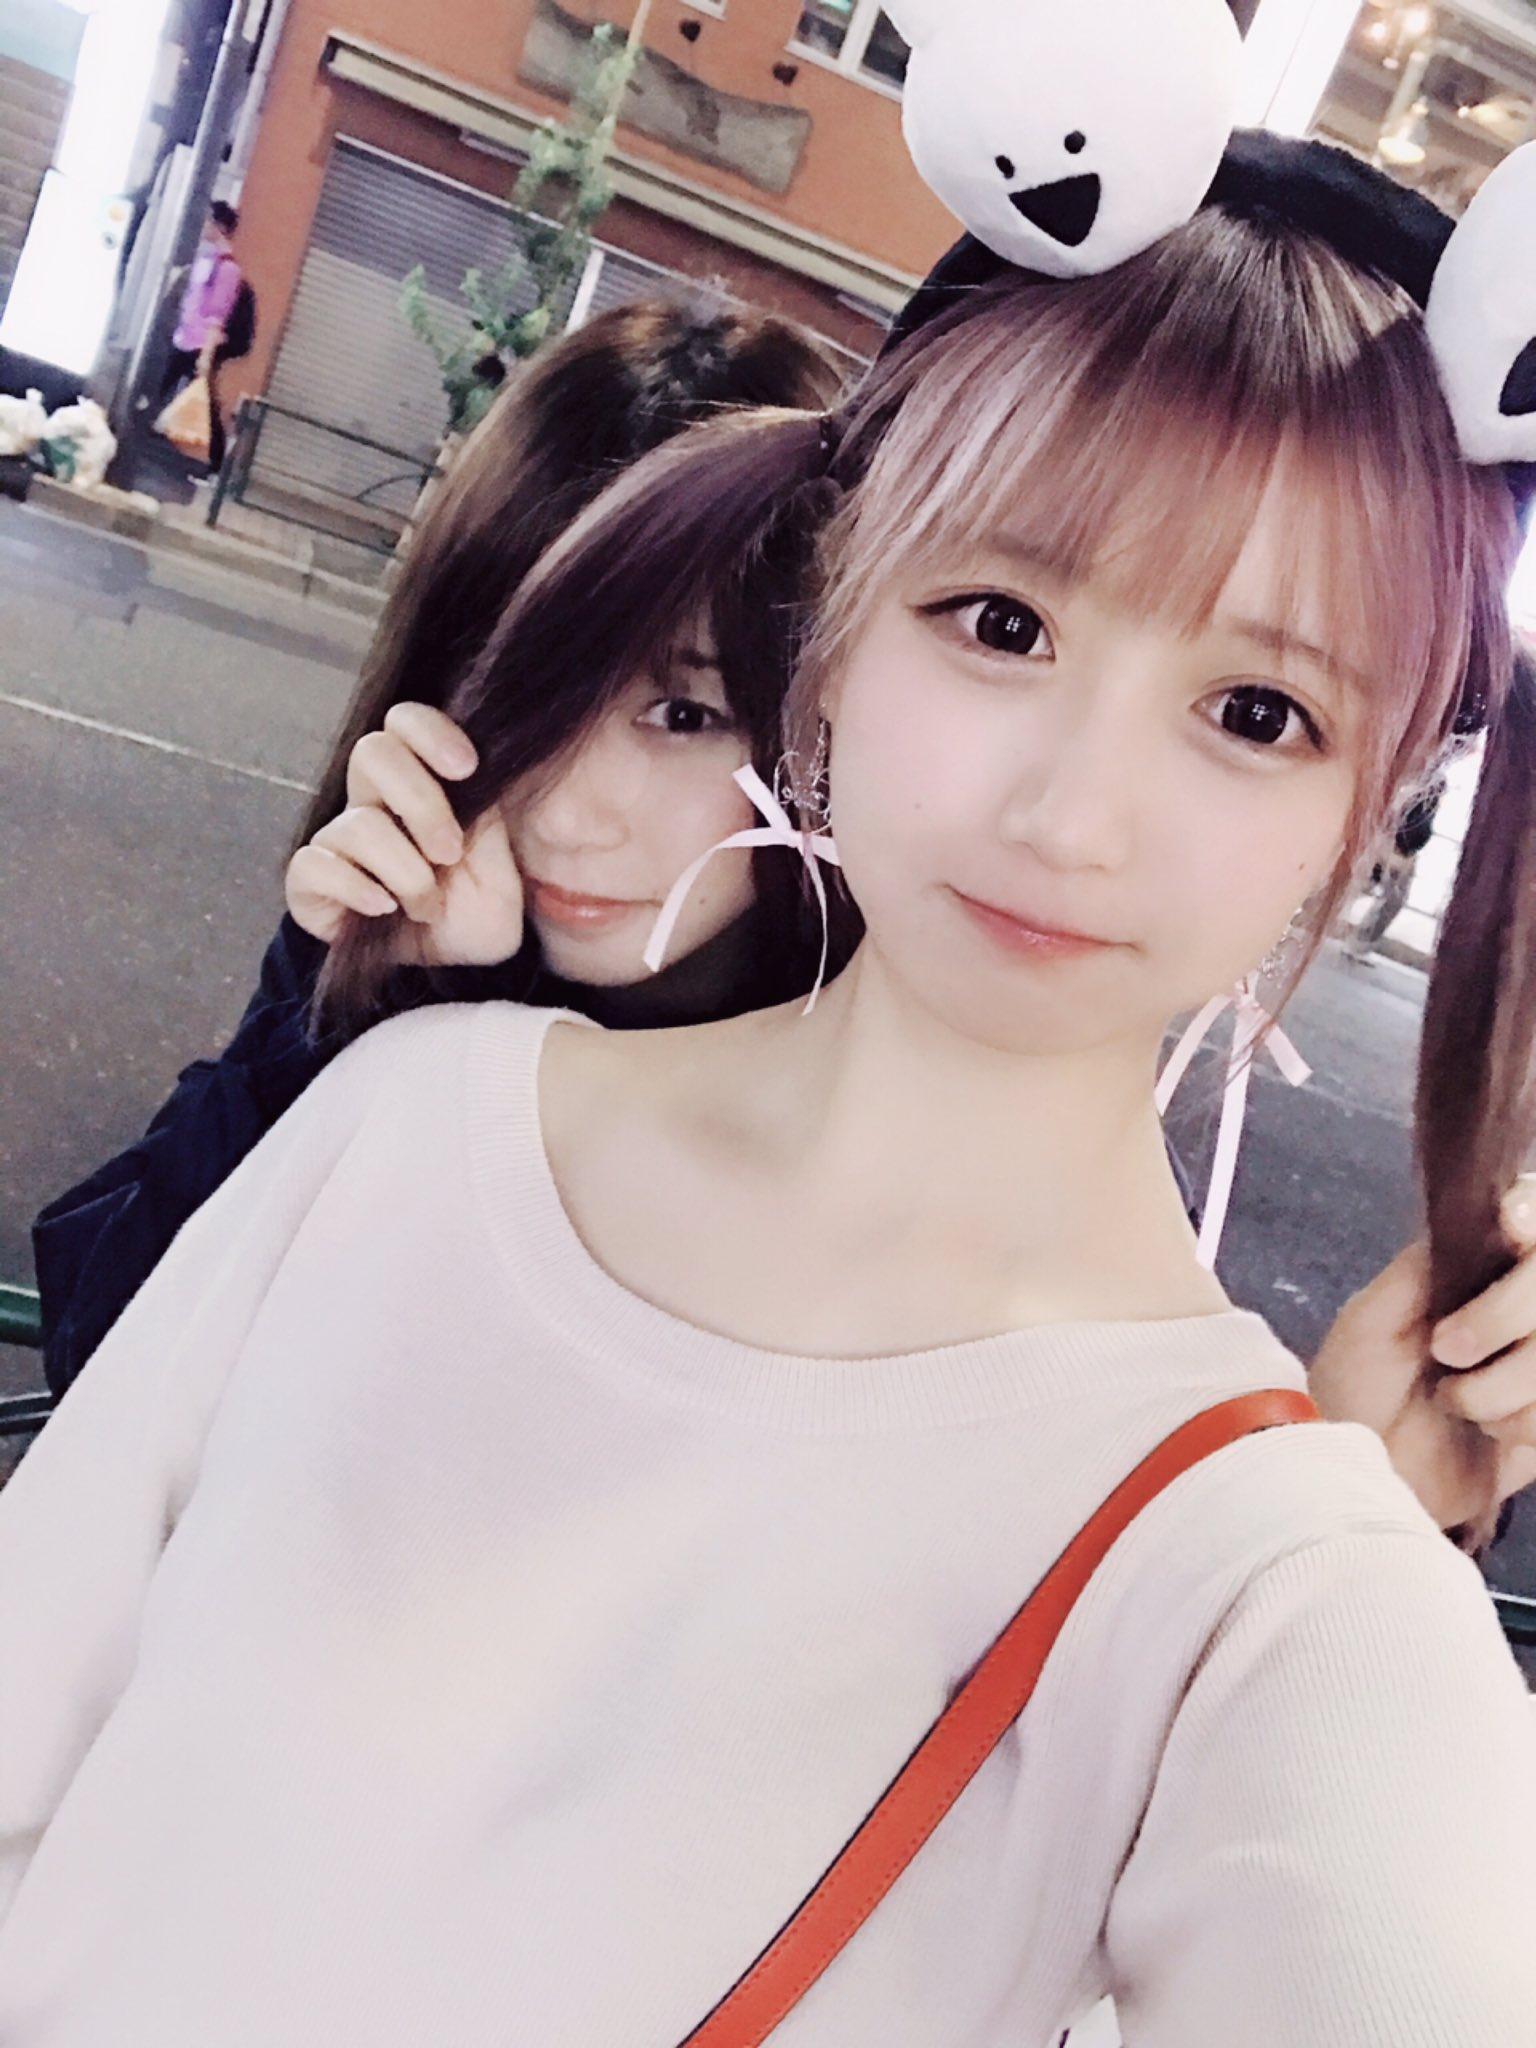 童颜巨乳COSER小姐姐yami推特图集 Yami-twitter9(19)